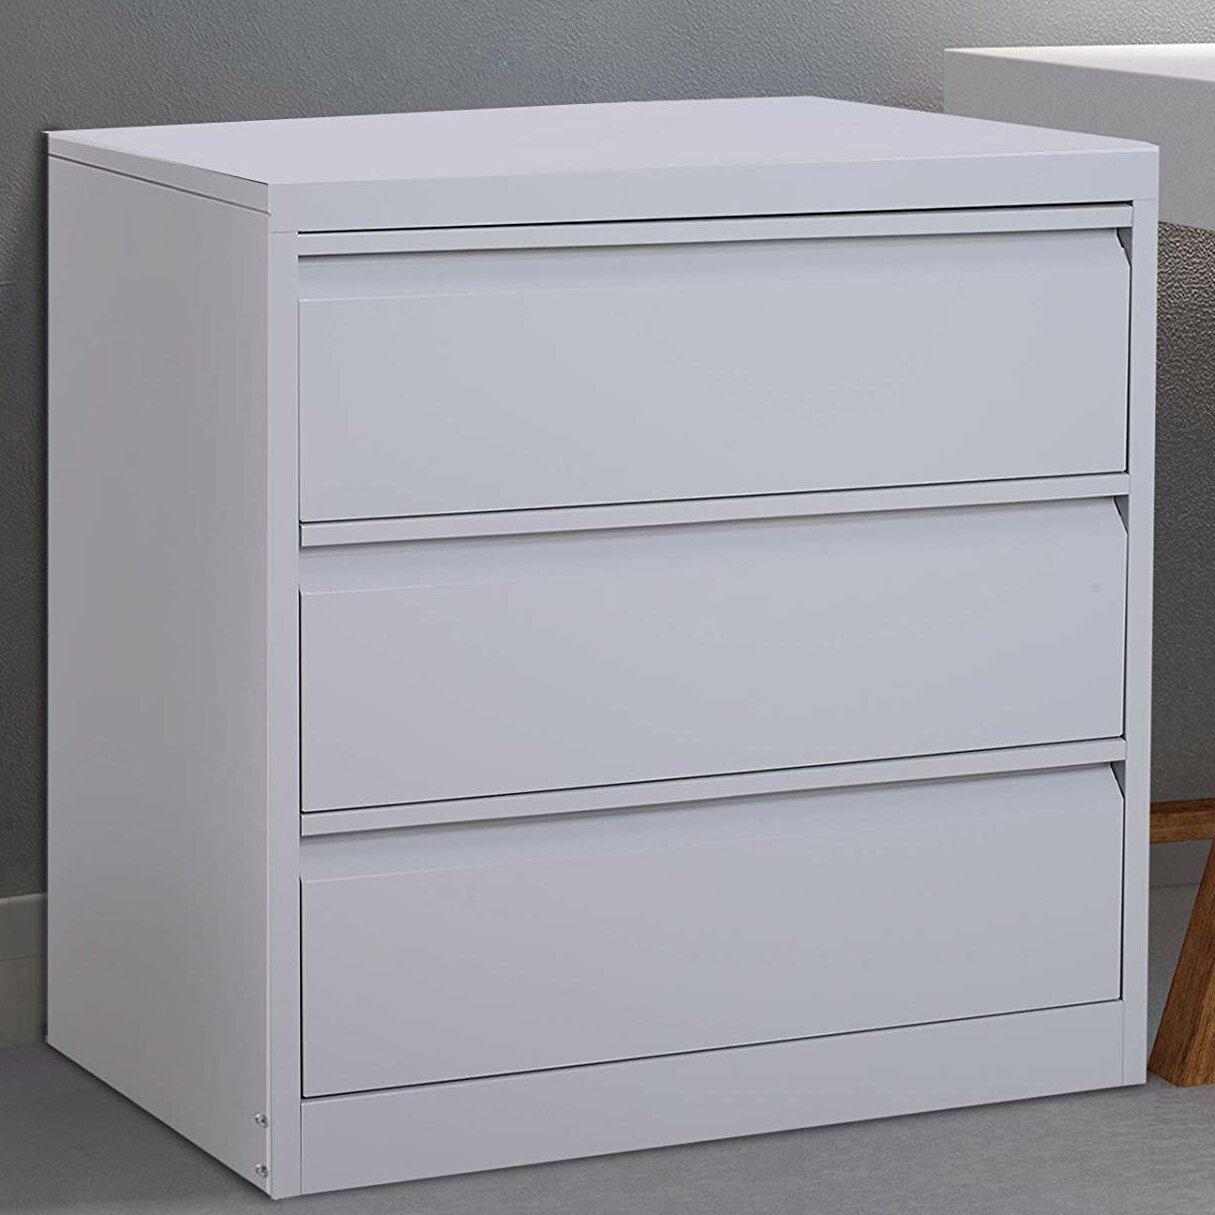 Symple Stuff Tamra Metal 3 Drawer Lateral Filing Cabinet